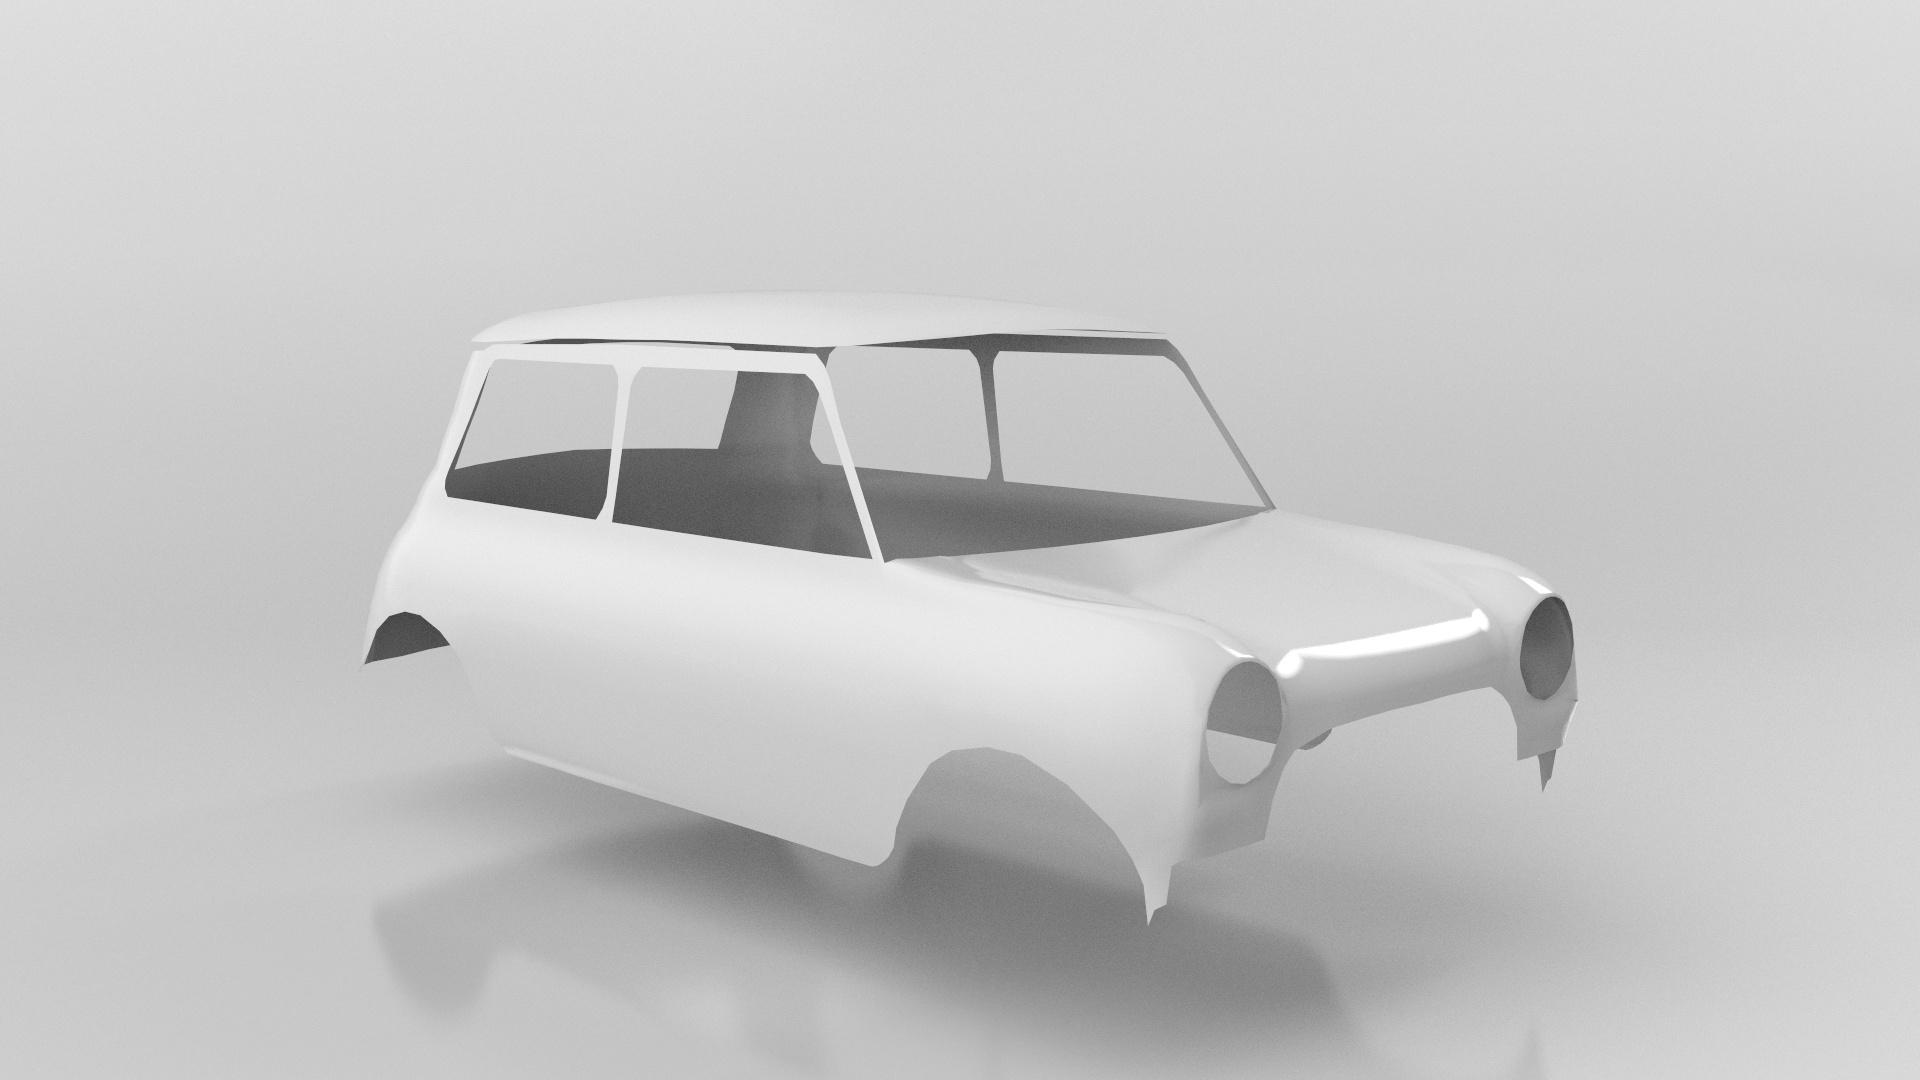 Monte Carlo Mini - Car Render Challenge 2020